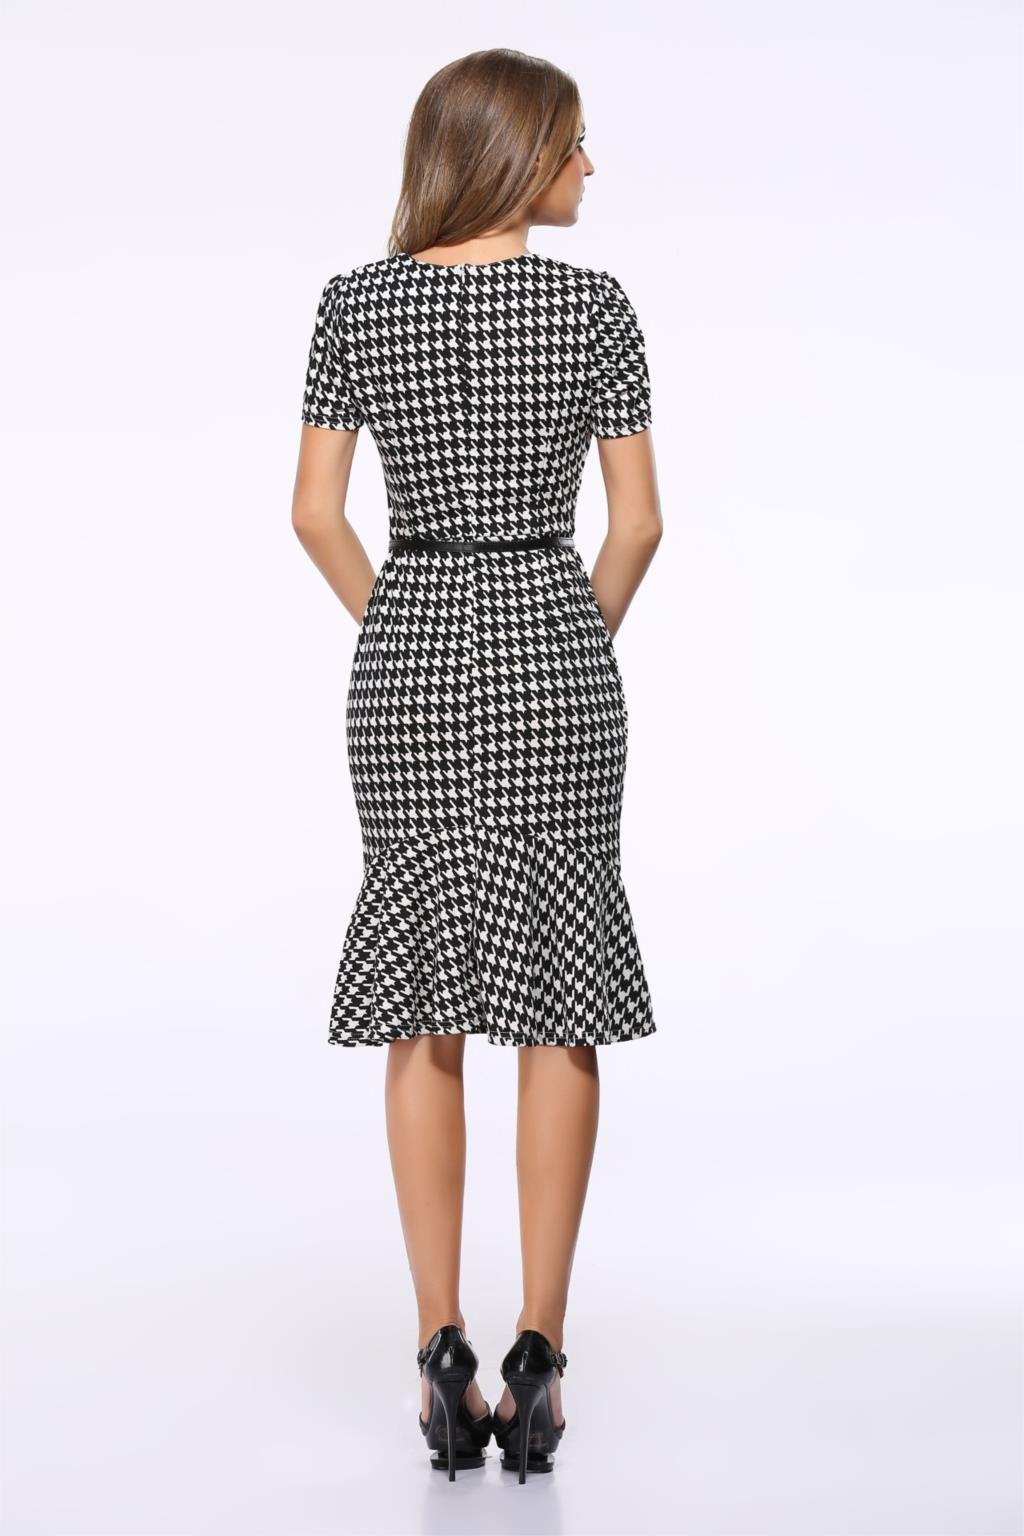 Women dresses AliExpress Europe Elegant temperament Houndstooth Slim plaid package hip fishtail dress free belt vestidos LH713